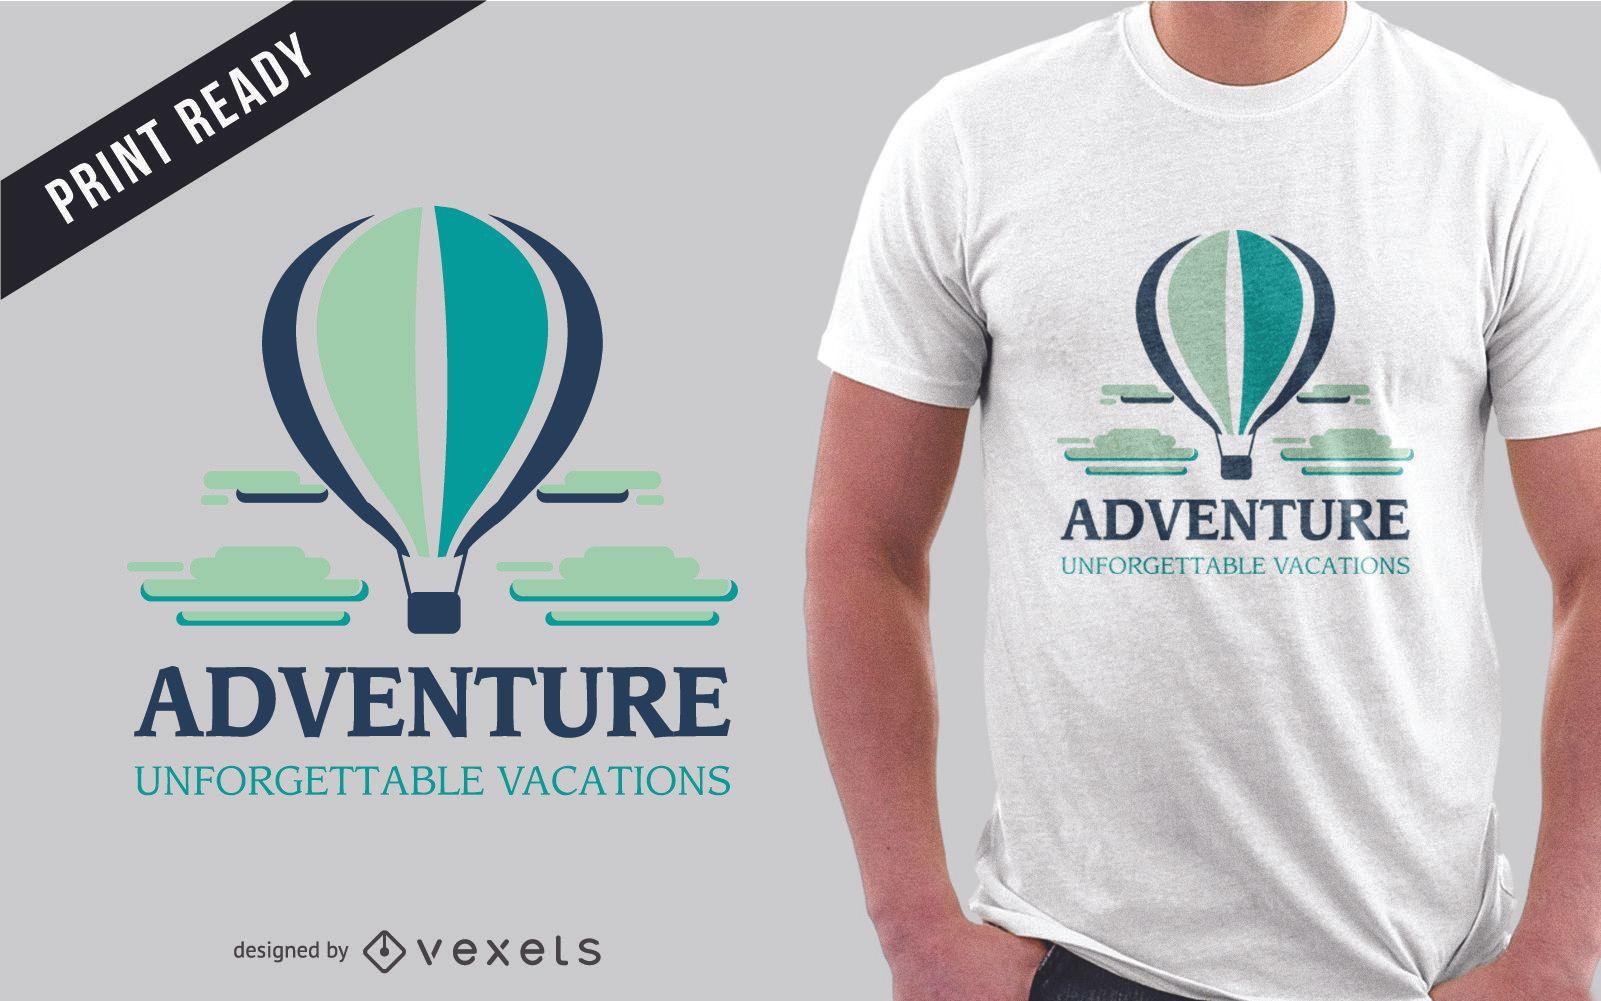 Travel adventure t-shirt design